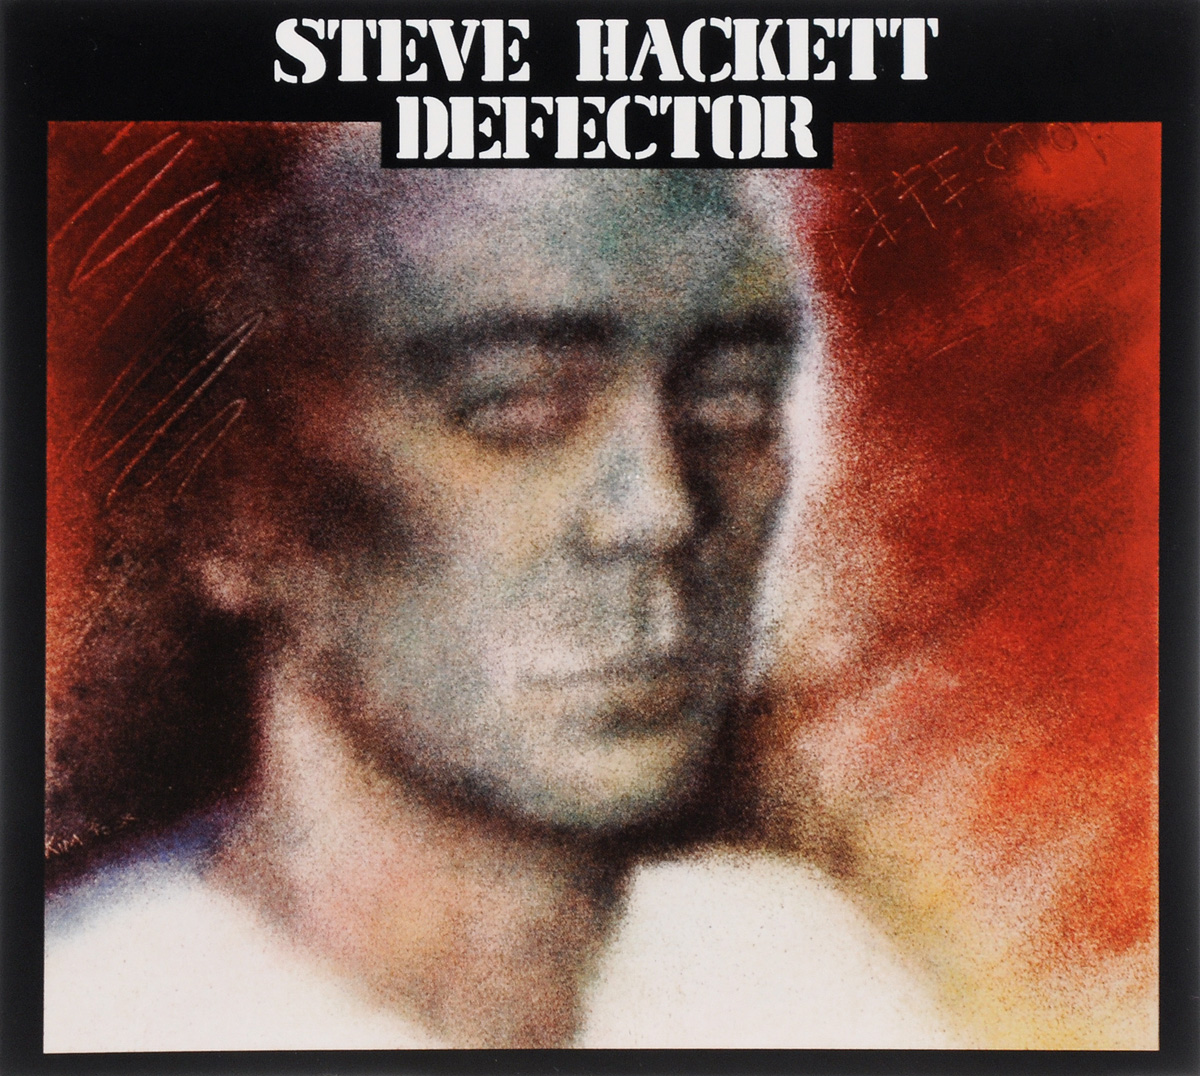 Стив Хэкетт Steve Hackett. Defector (2 CD + DVD) the vamps leeds